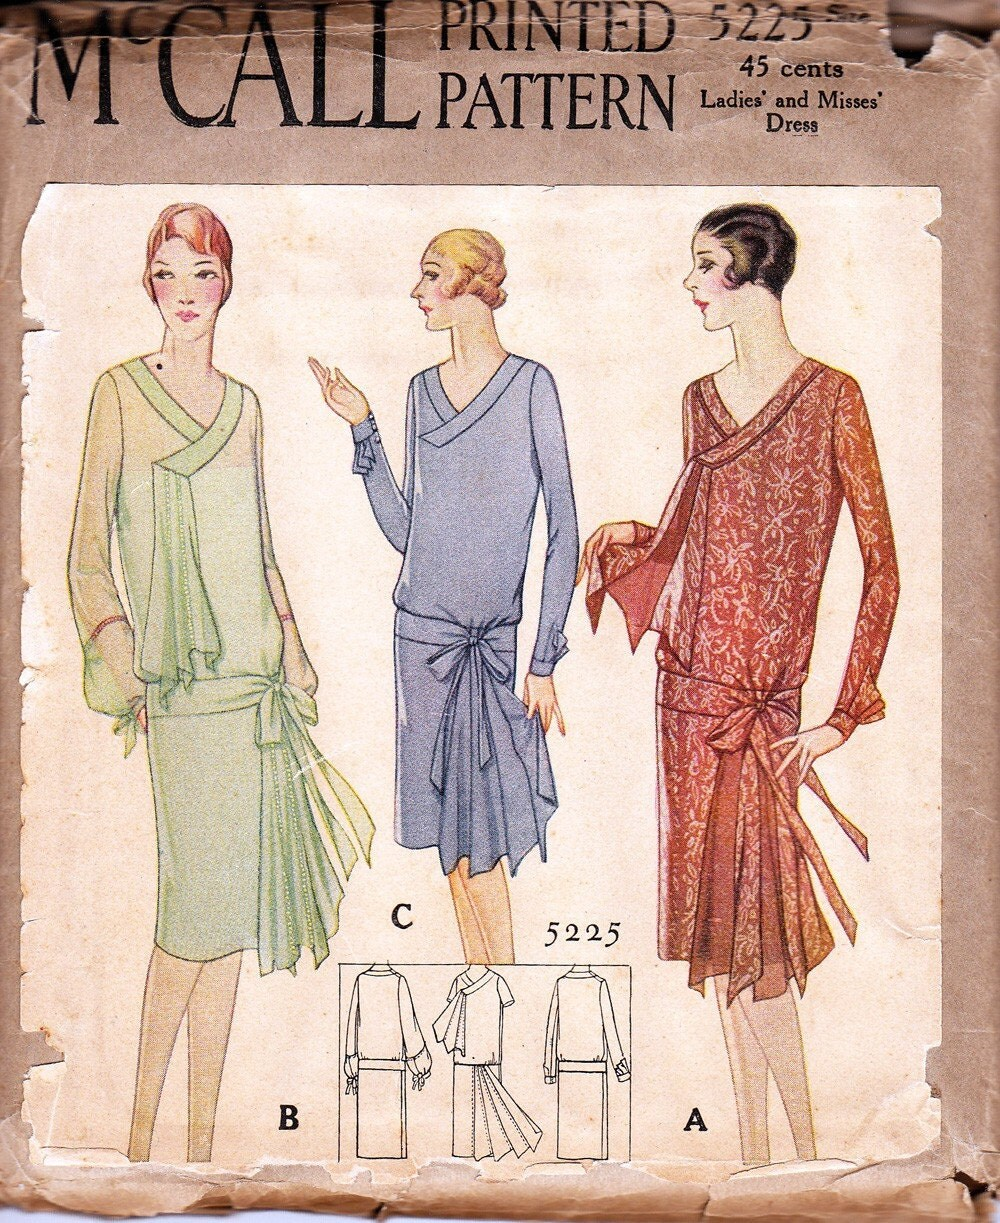 Vintage 1920s dress pattern McCall 5225